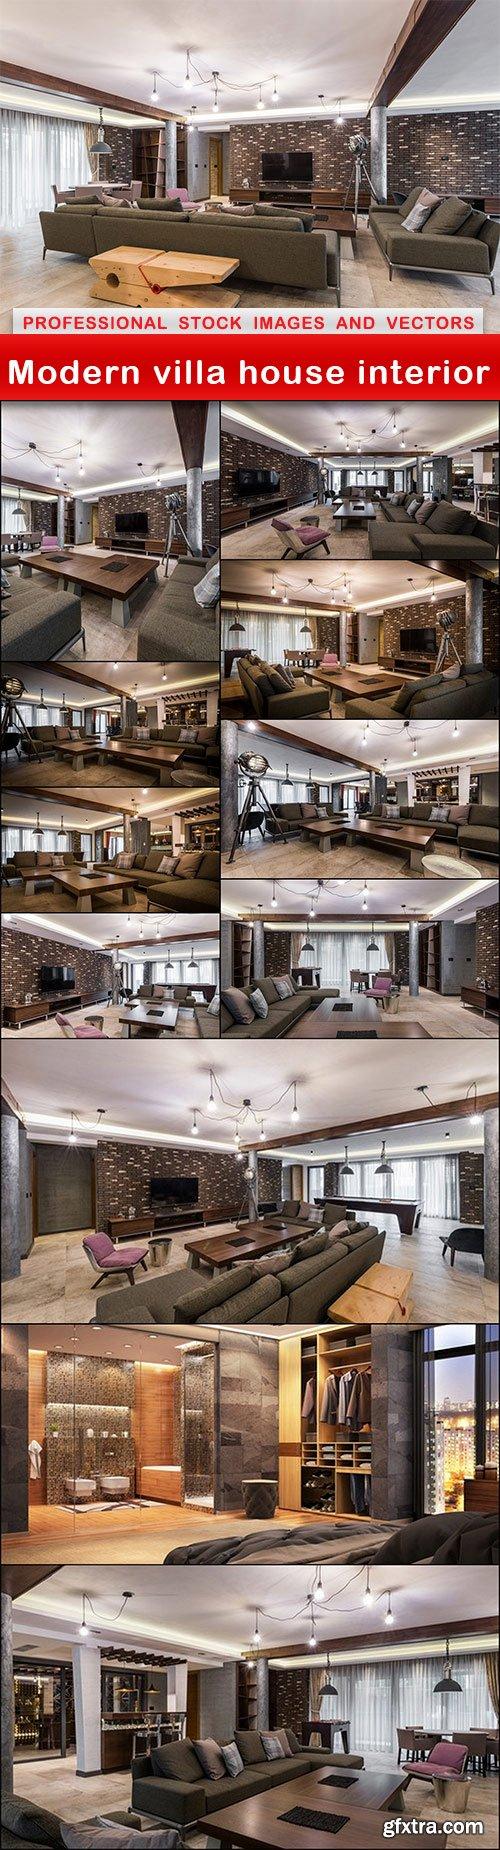 Modern villa house interior - 12 UHQ JPEG